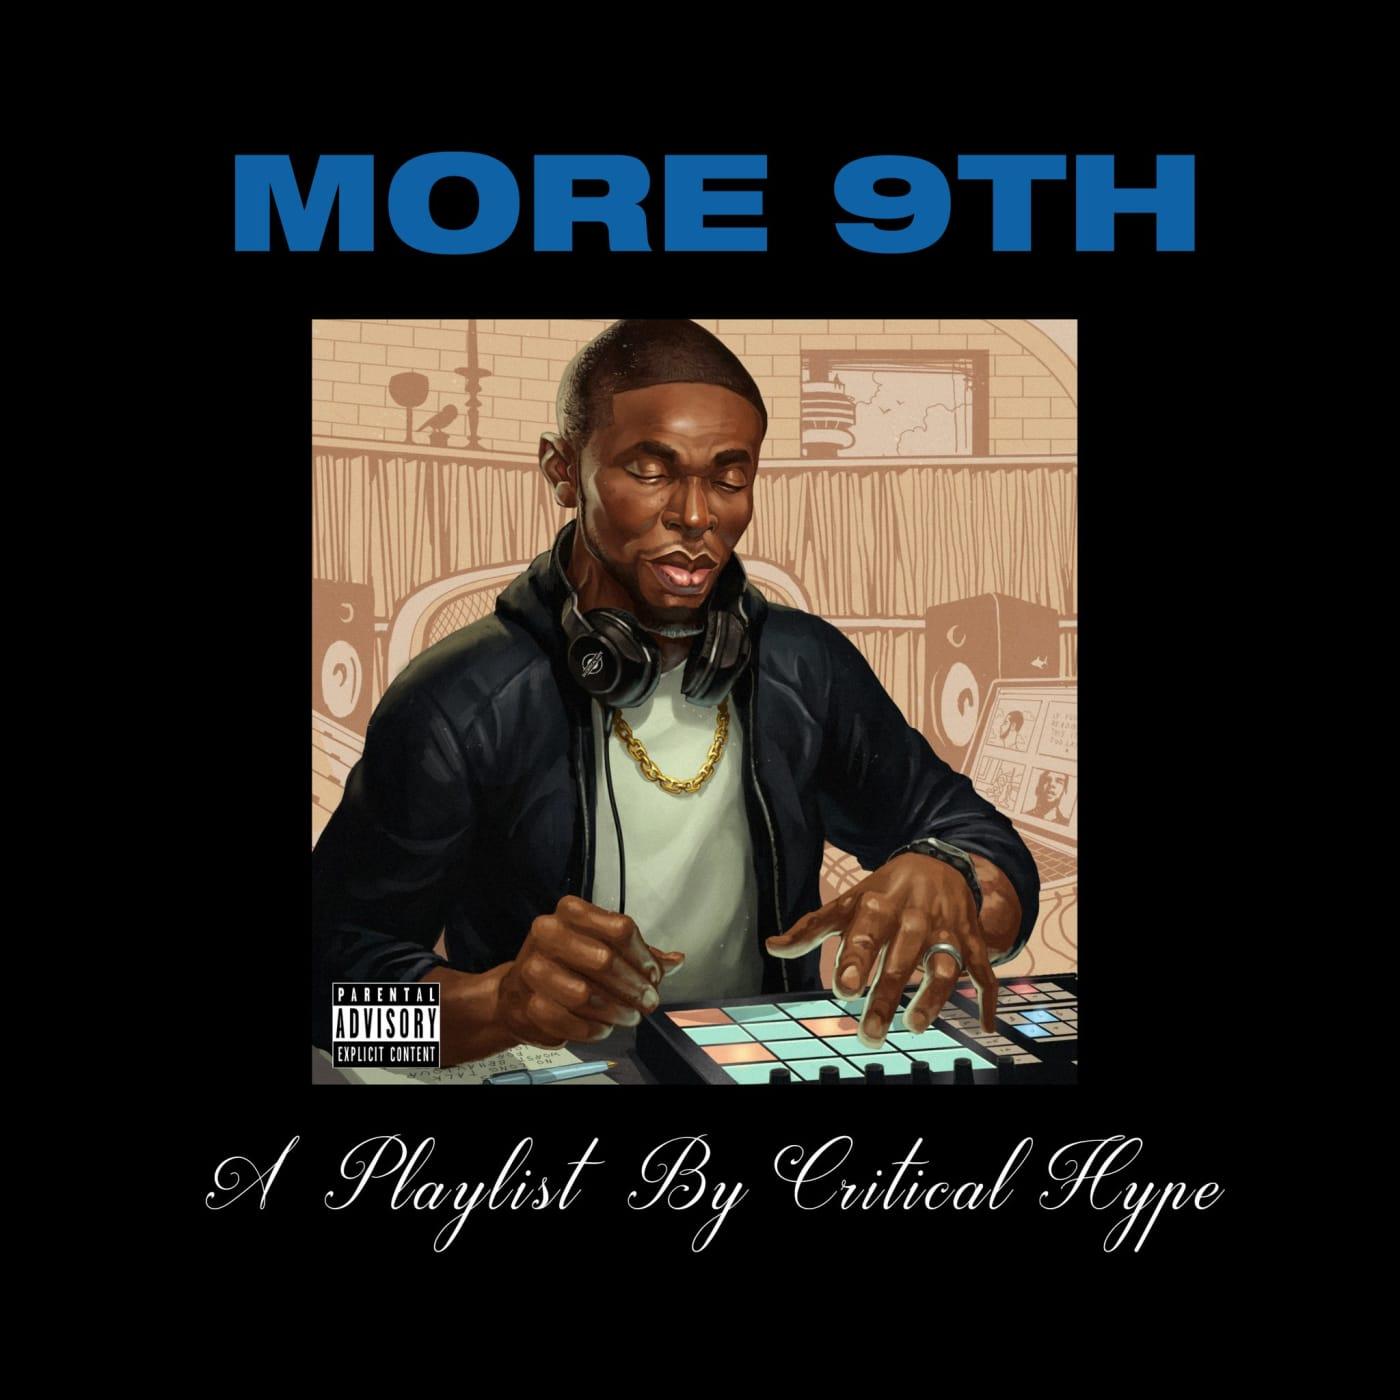 more 9th dj critical hype cover artwork